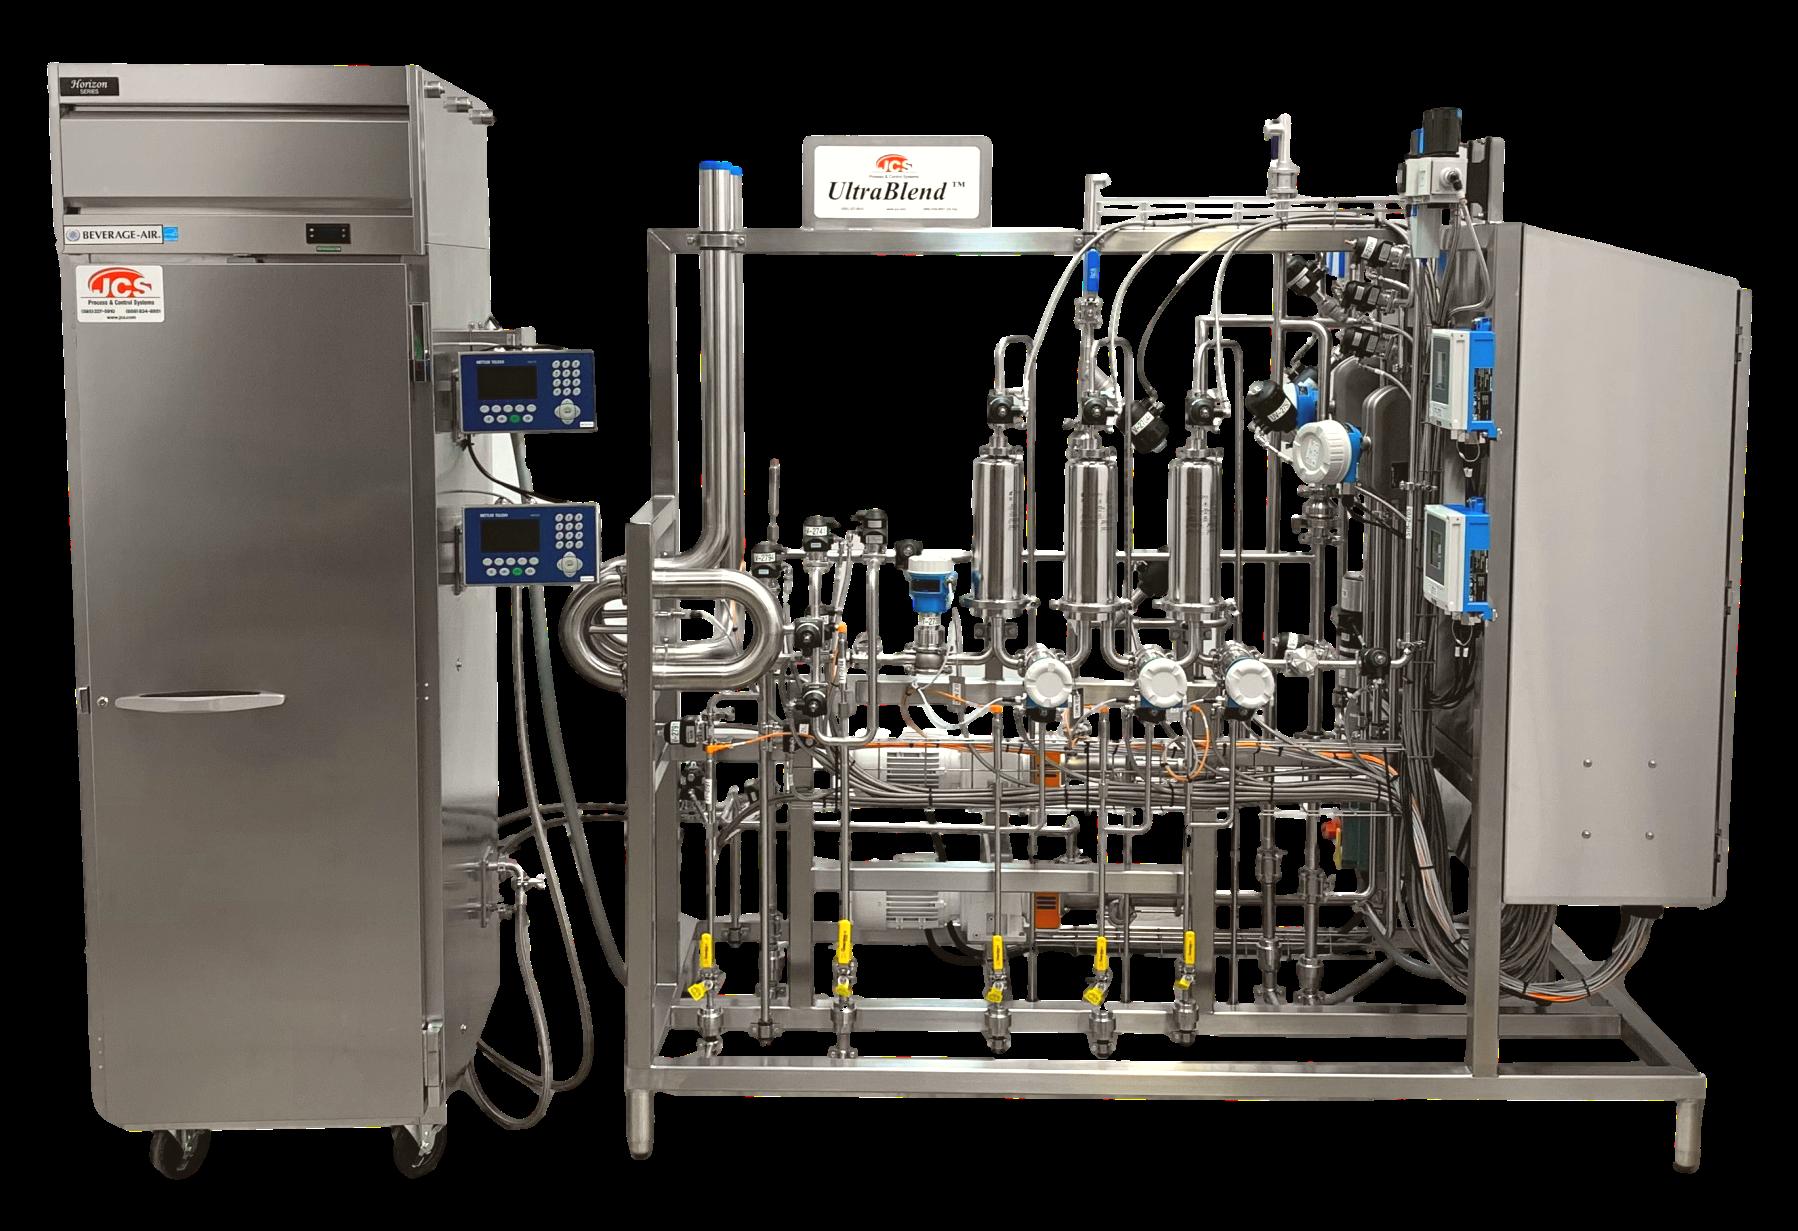 JCS UltraBlend™ for enzyme dosing